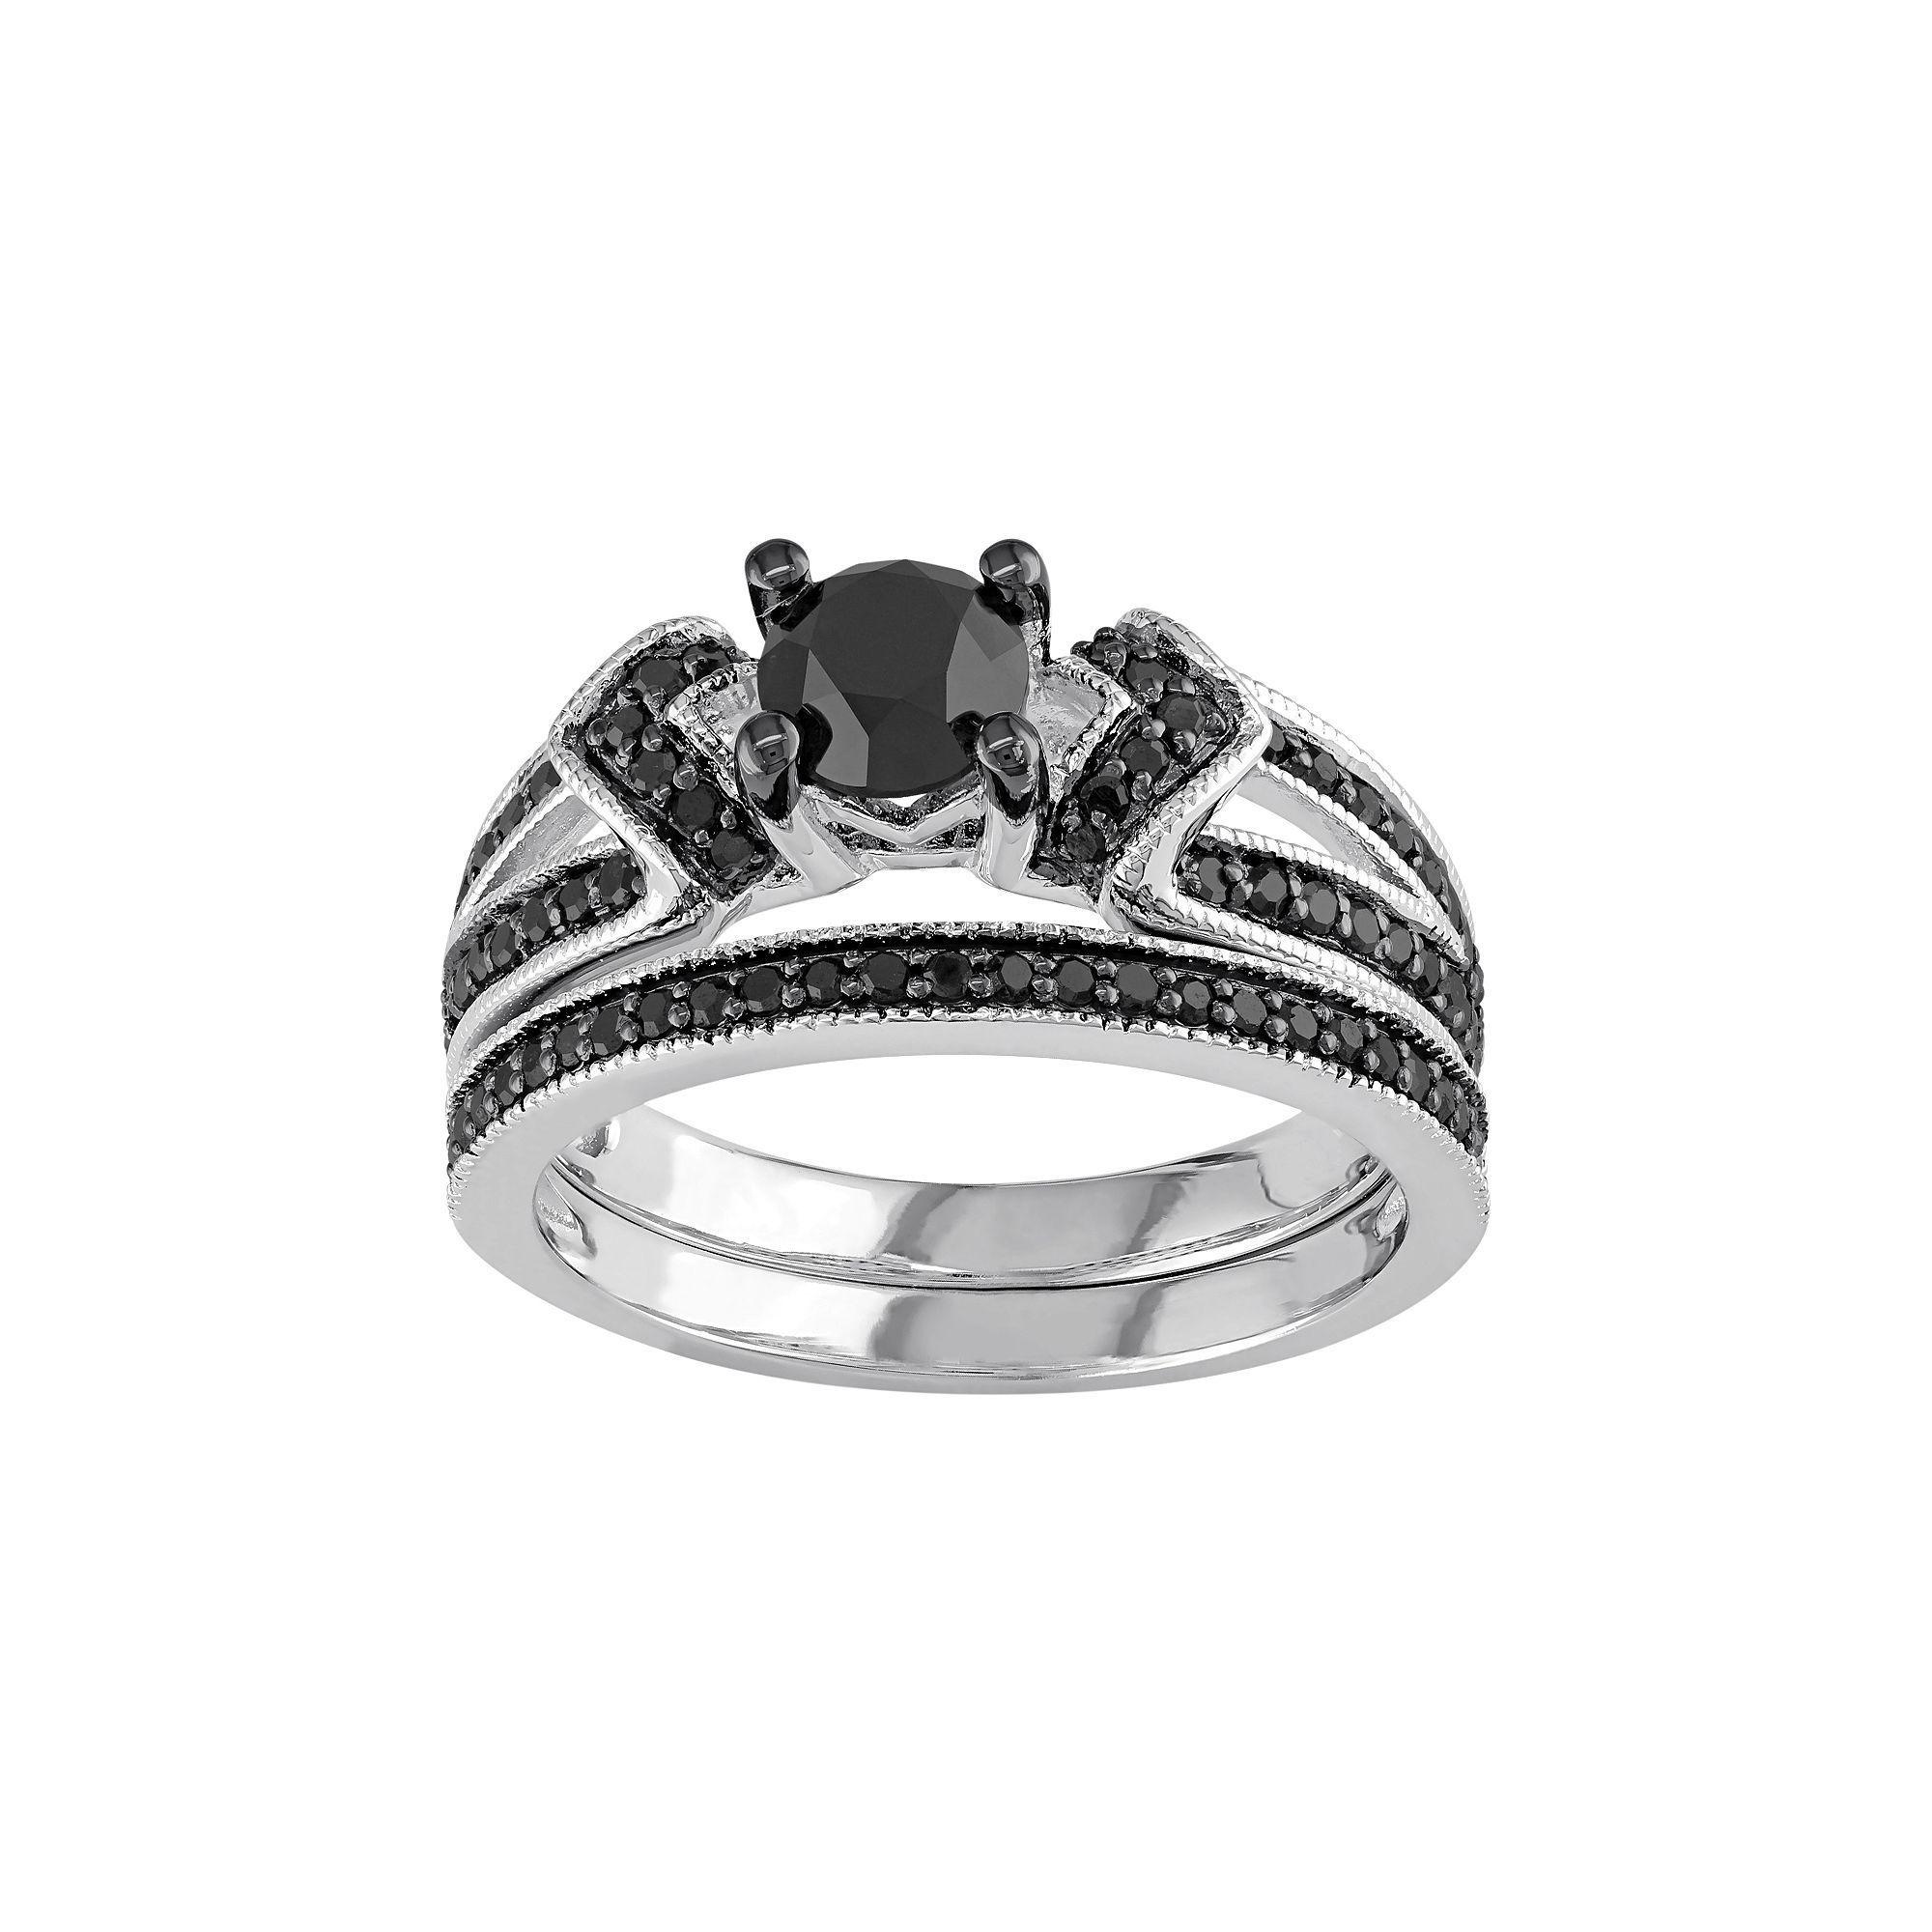 1 Carat Black Diamond Ring Set In Sterling Silver